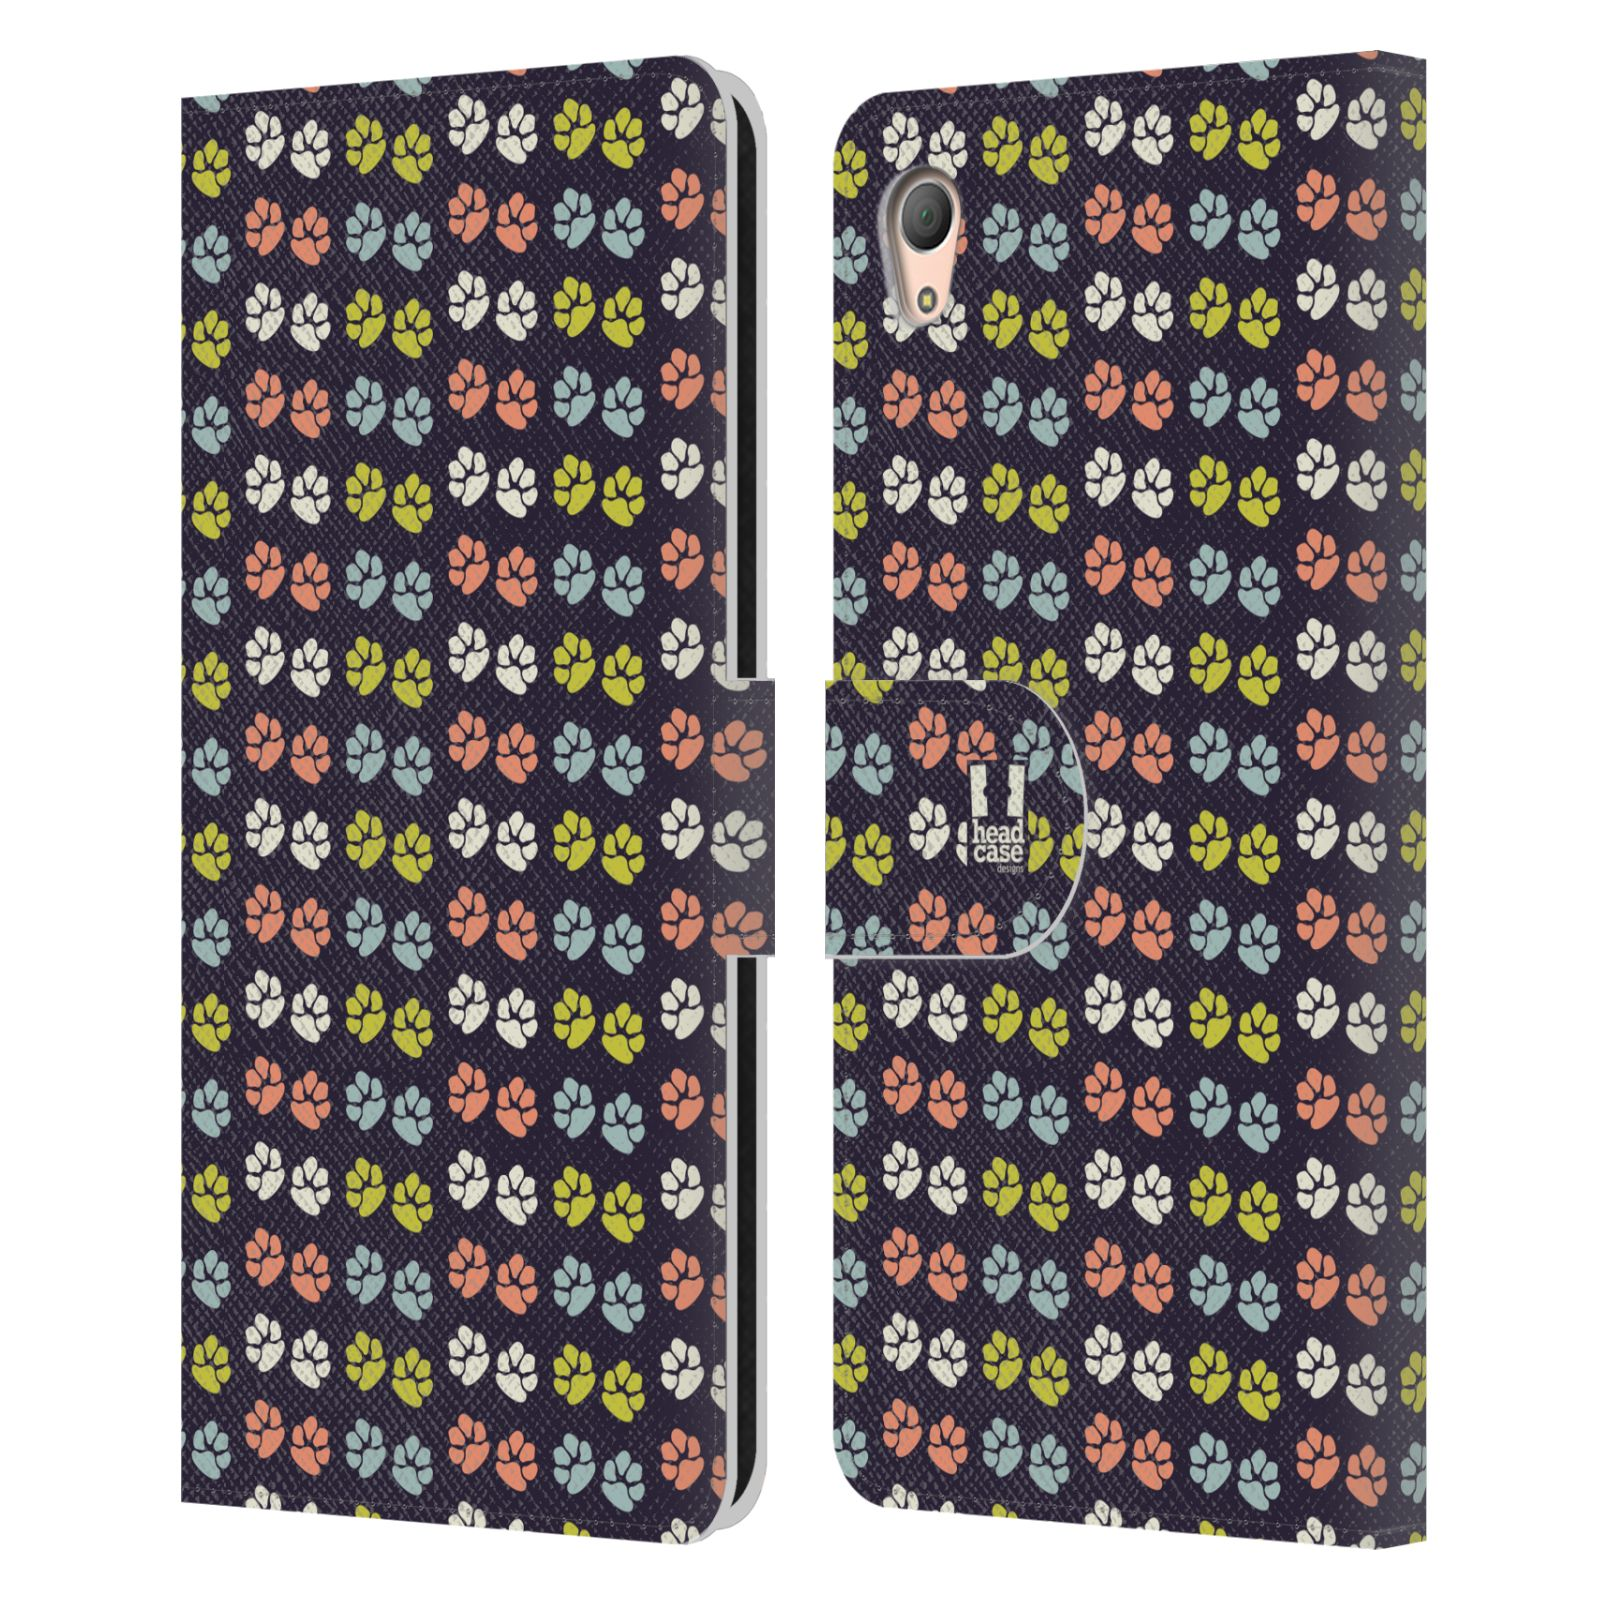 HEAD CASE Flipové pouzdro pro mobil SONY XPERIA Z3+ (PLUS) Pejsek ťapky barevné RETRO